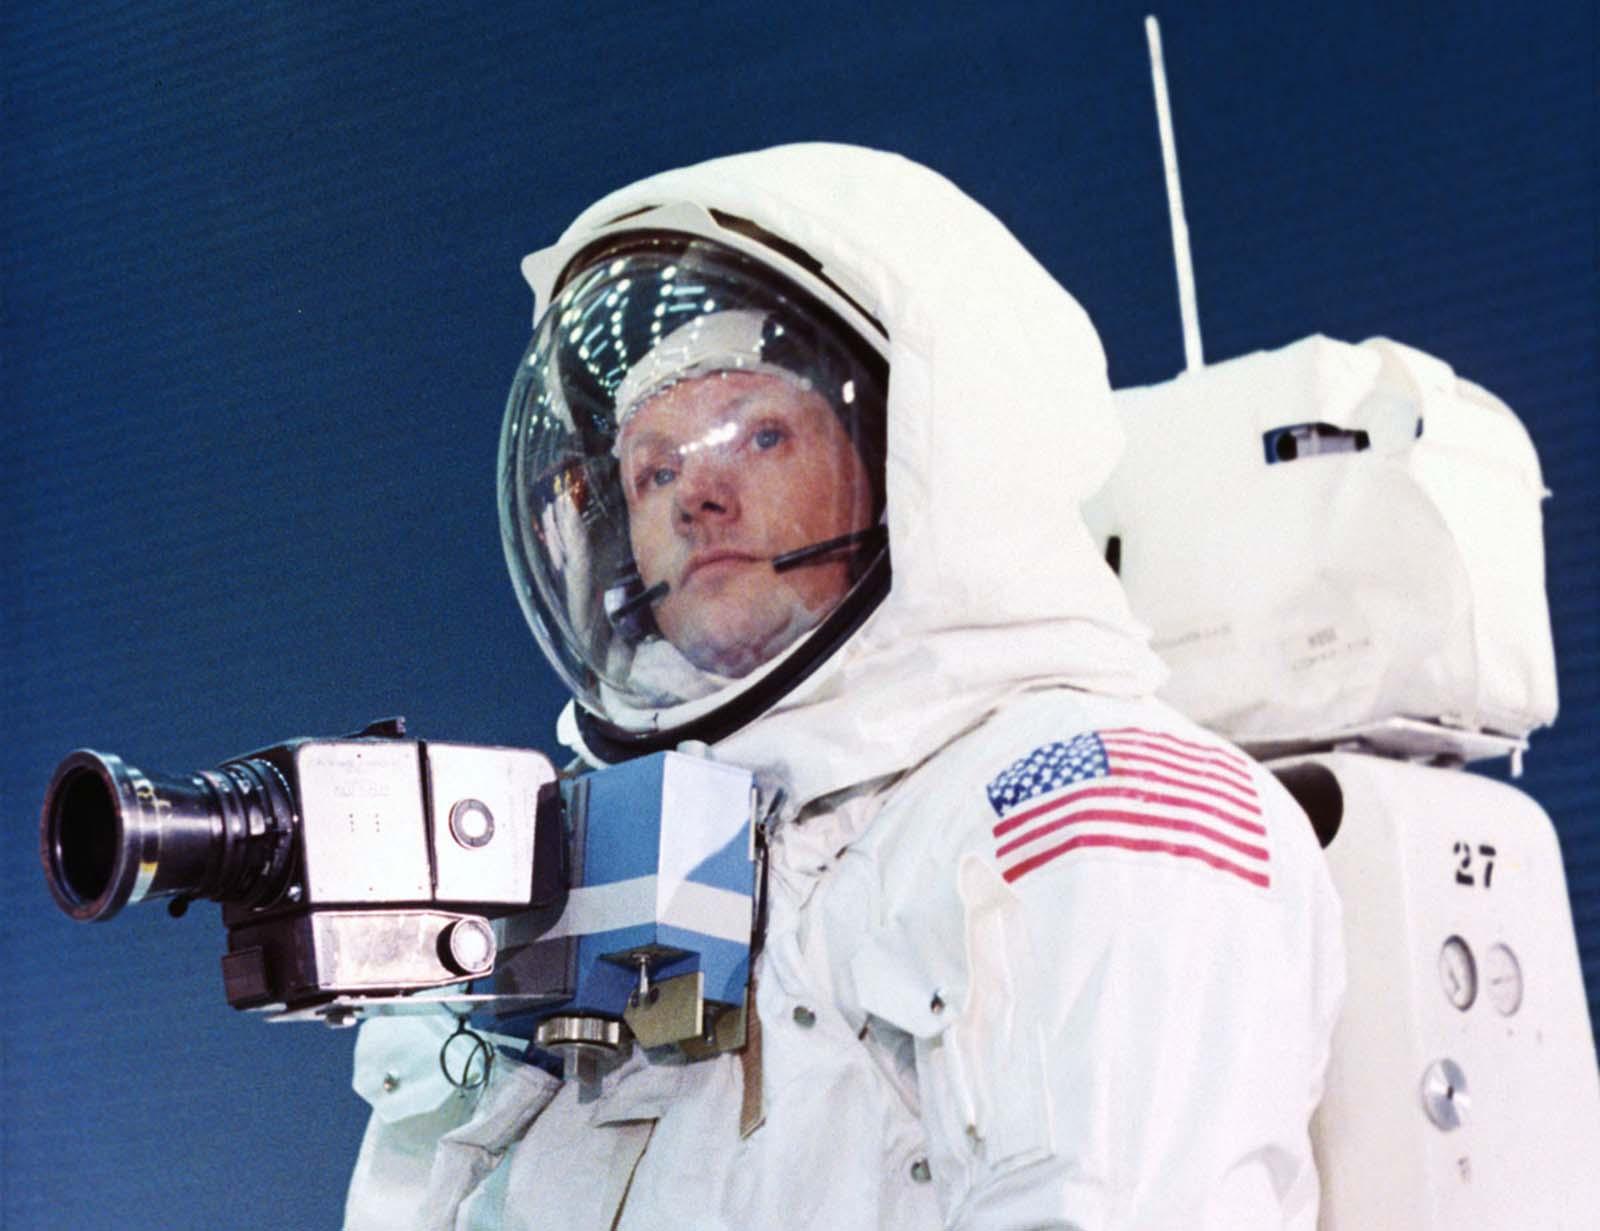 Apollo 11 Commander Нил Армстронг